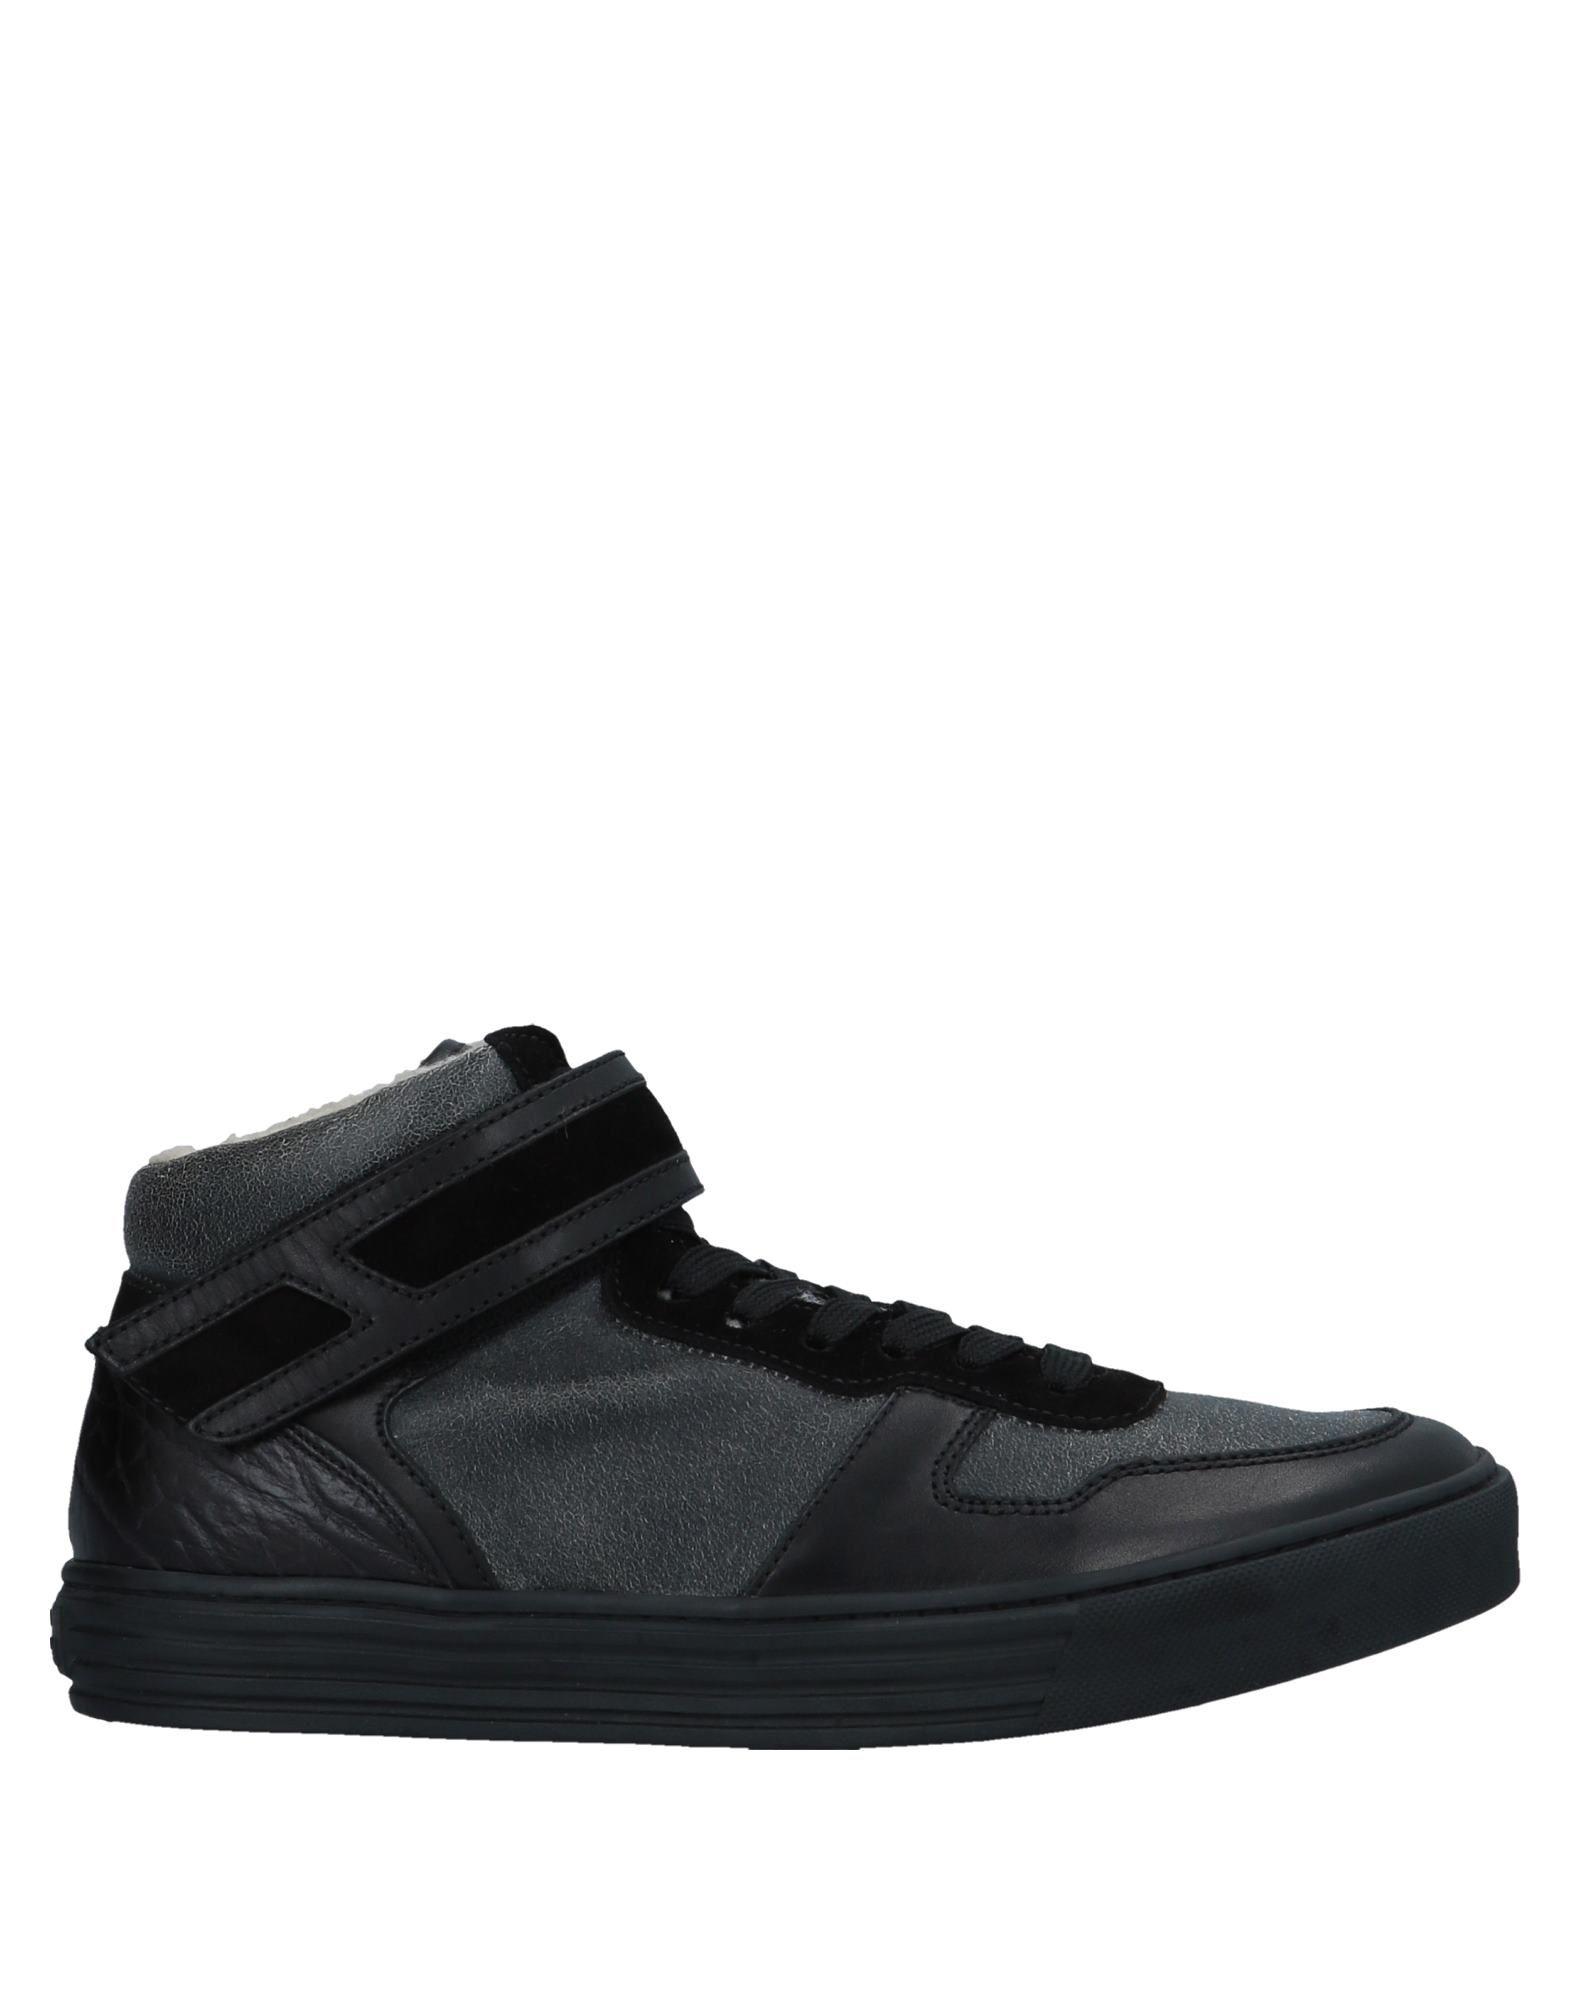 Hogan Rebel Sneakers Herren  11541289QJ Gute Qualität beliebte Schuhe